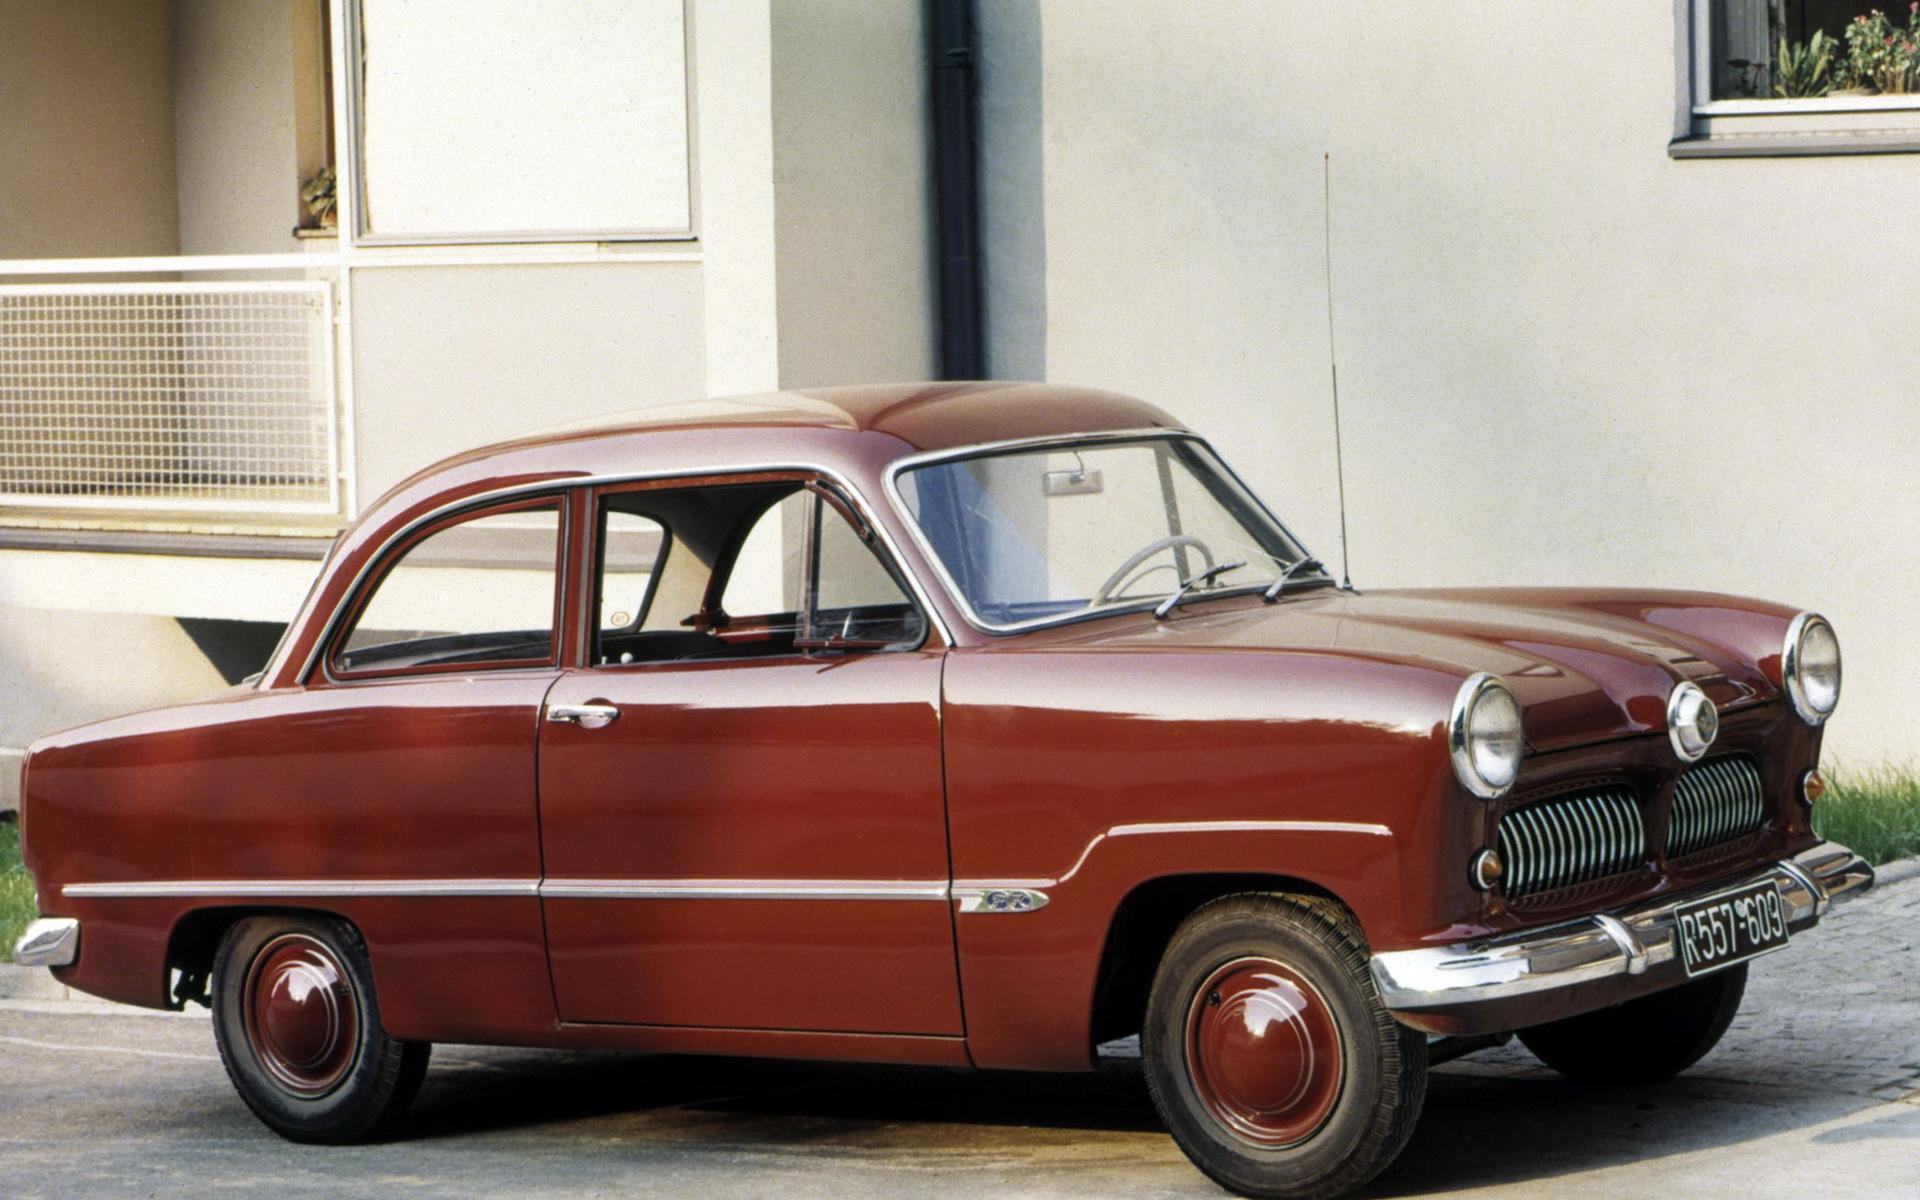 автомобиль, ретро, классика